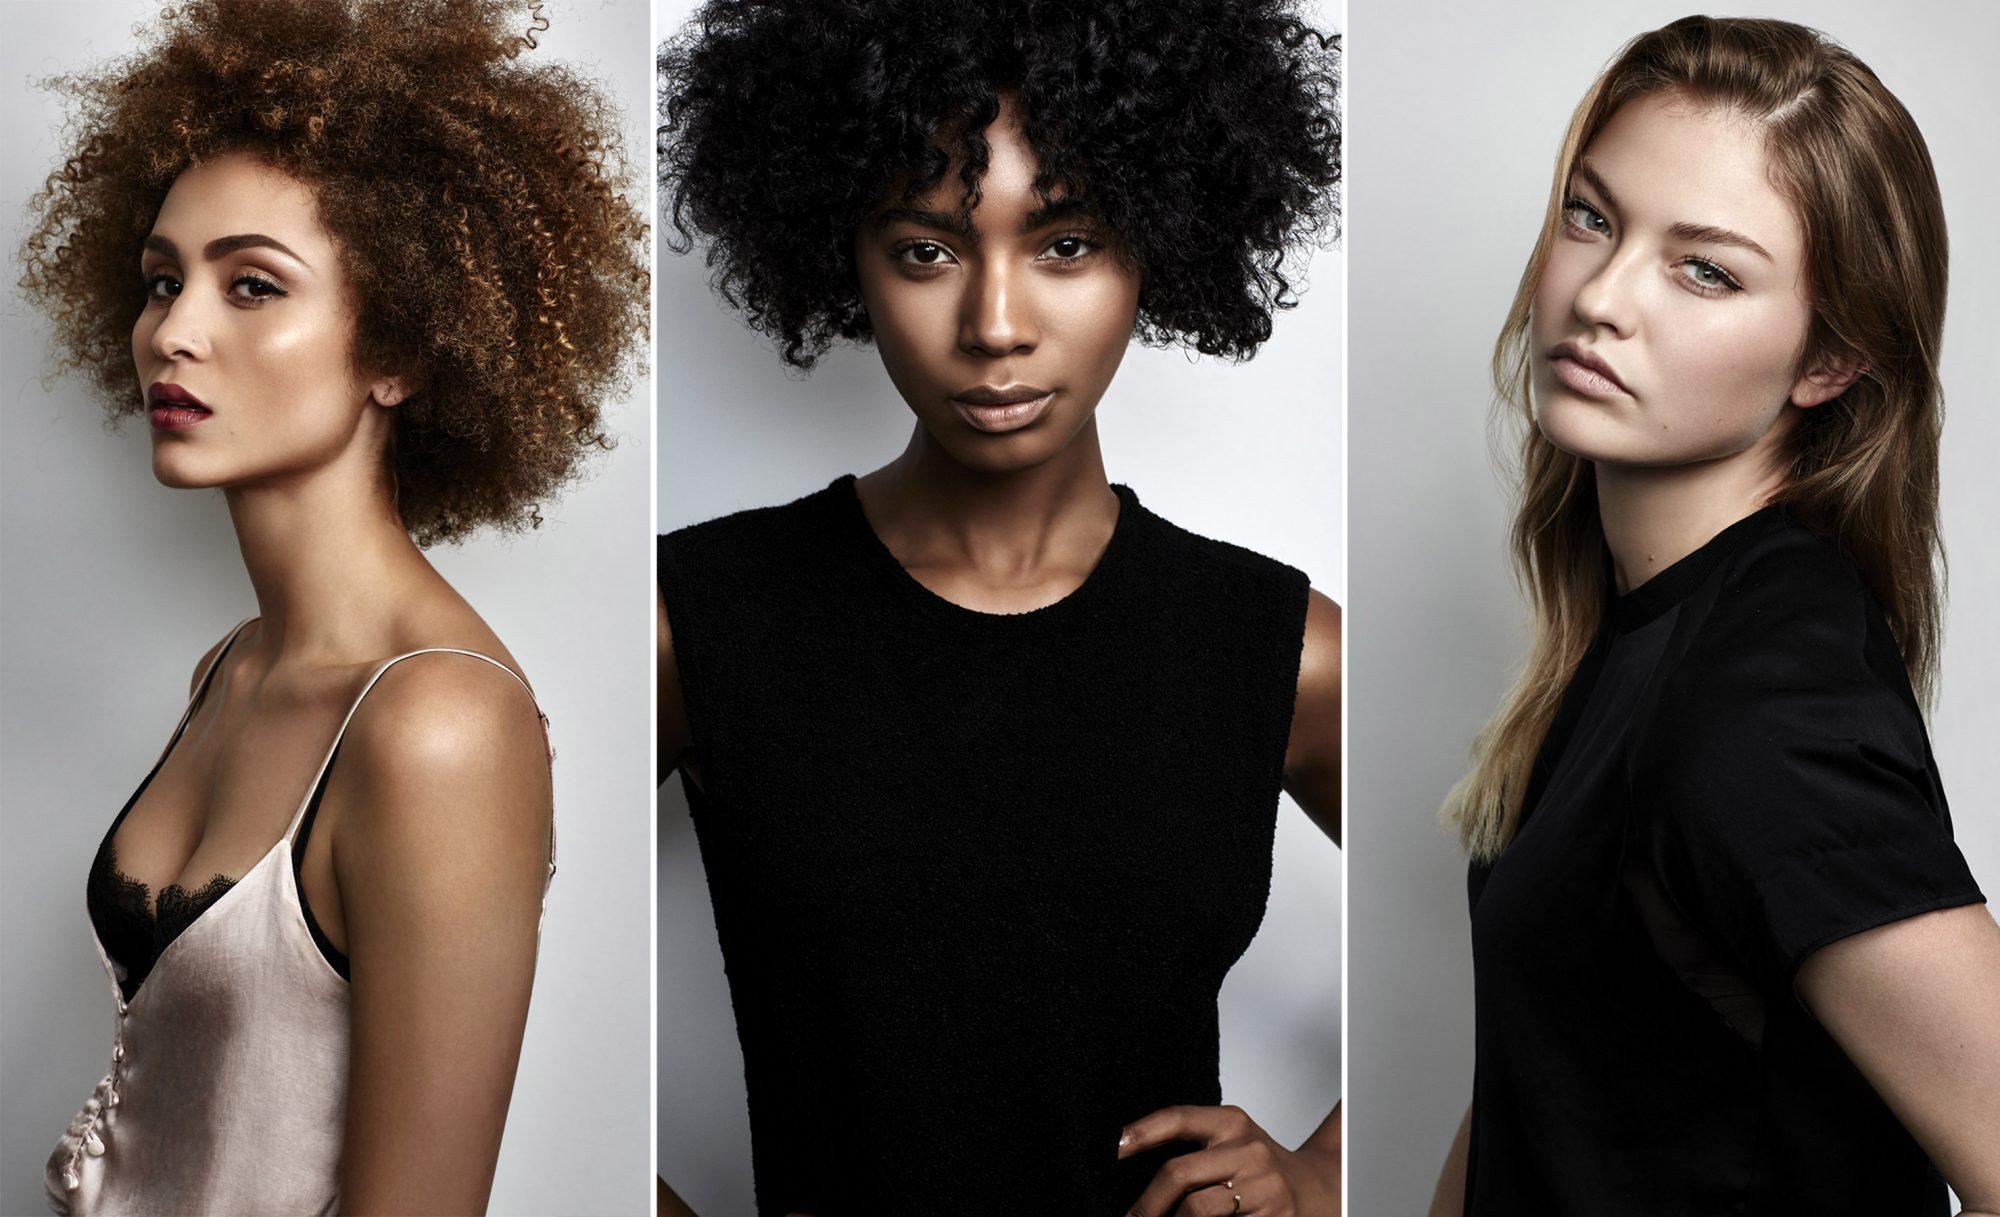 America's Next Top Model finale